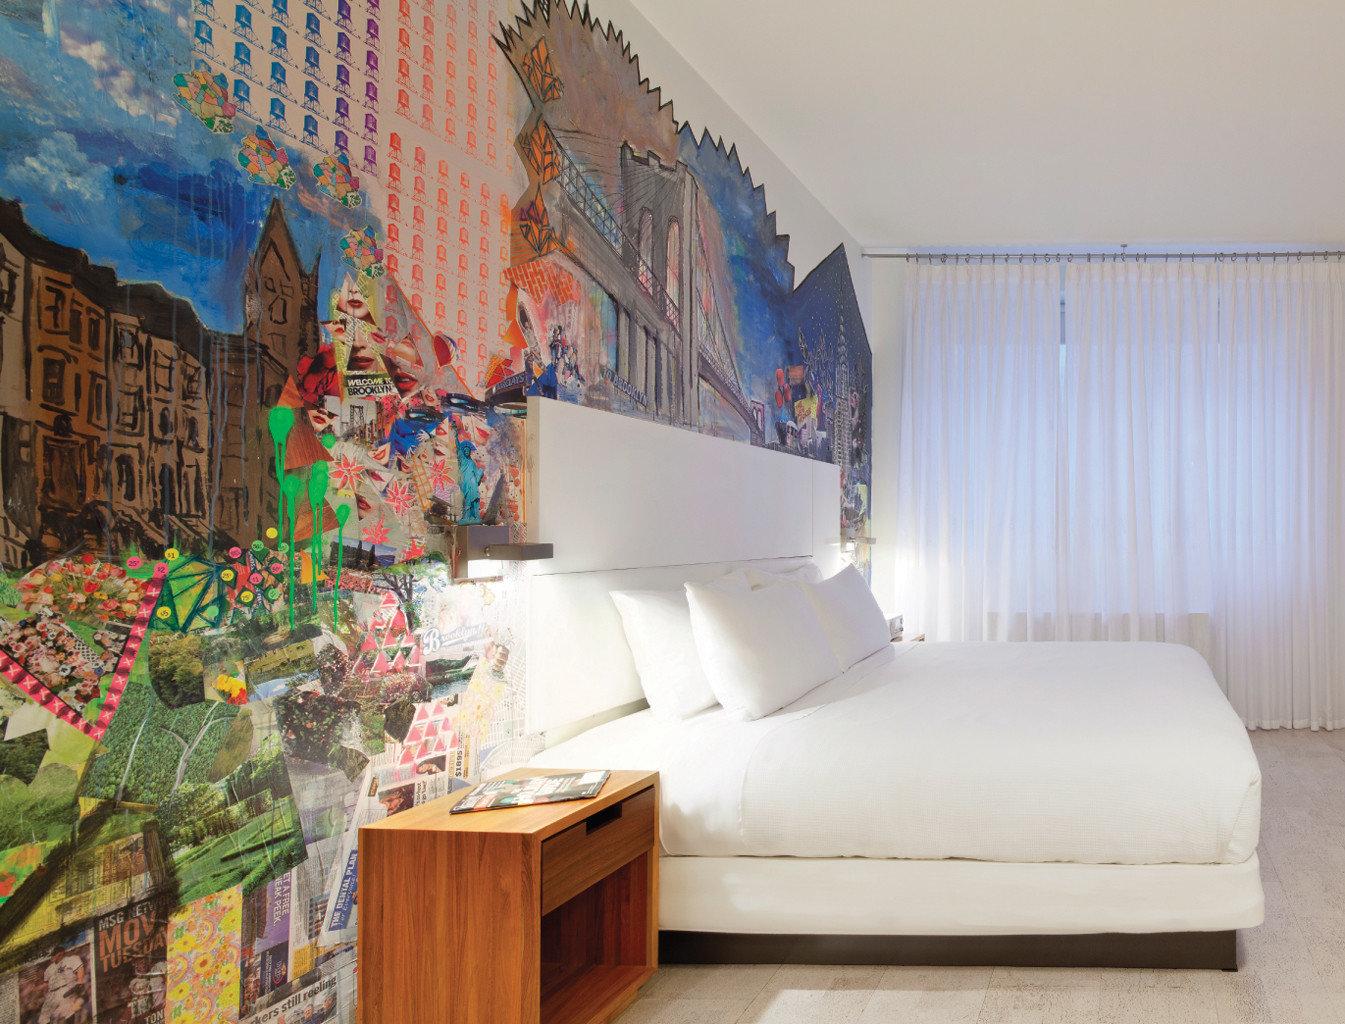 Bedroom Budget City Hotels Modern wall indoor room property mural interior design furniture decorated